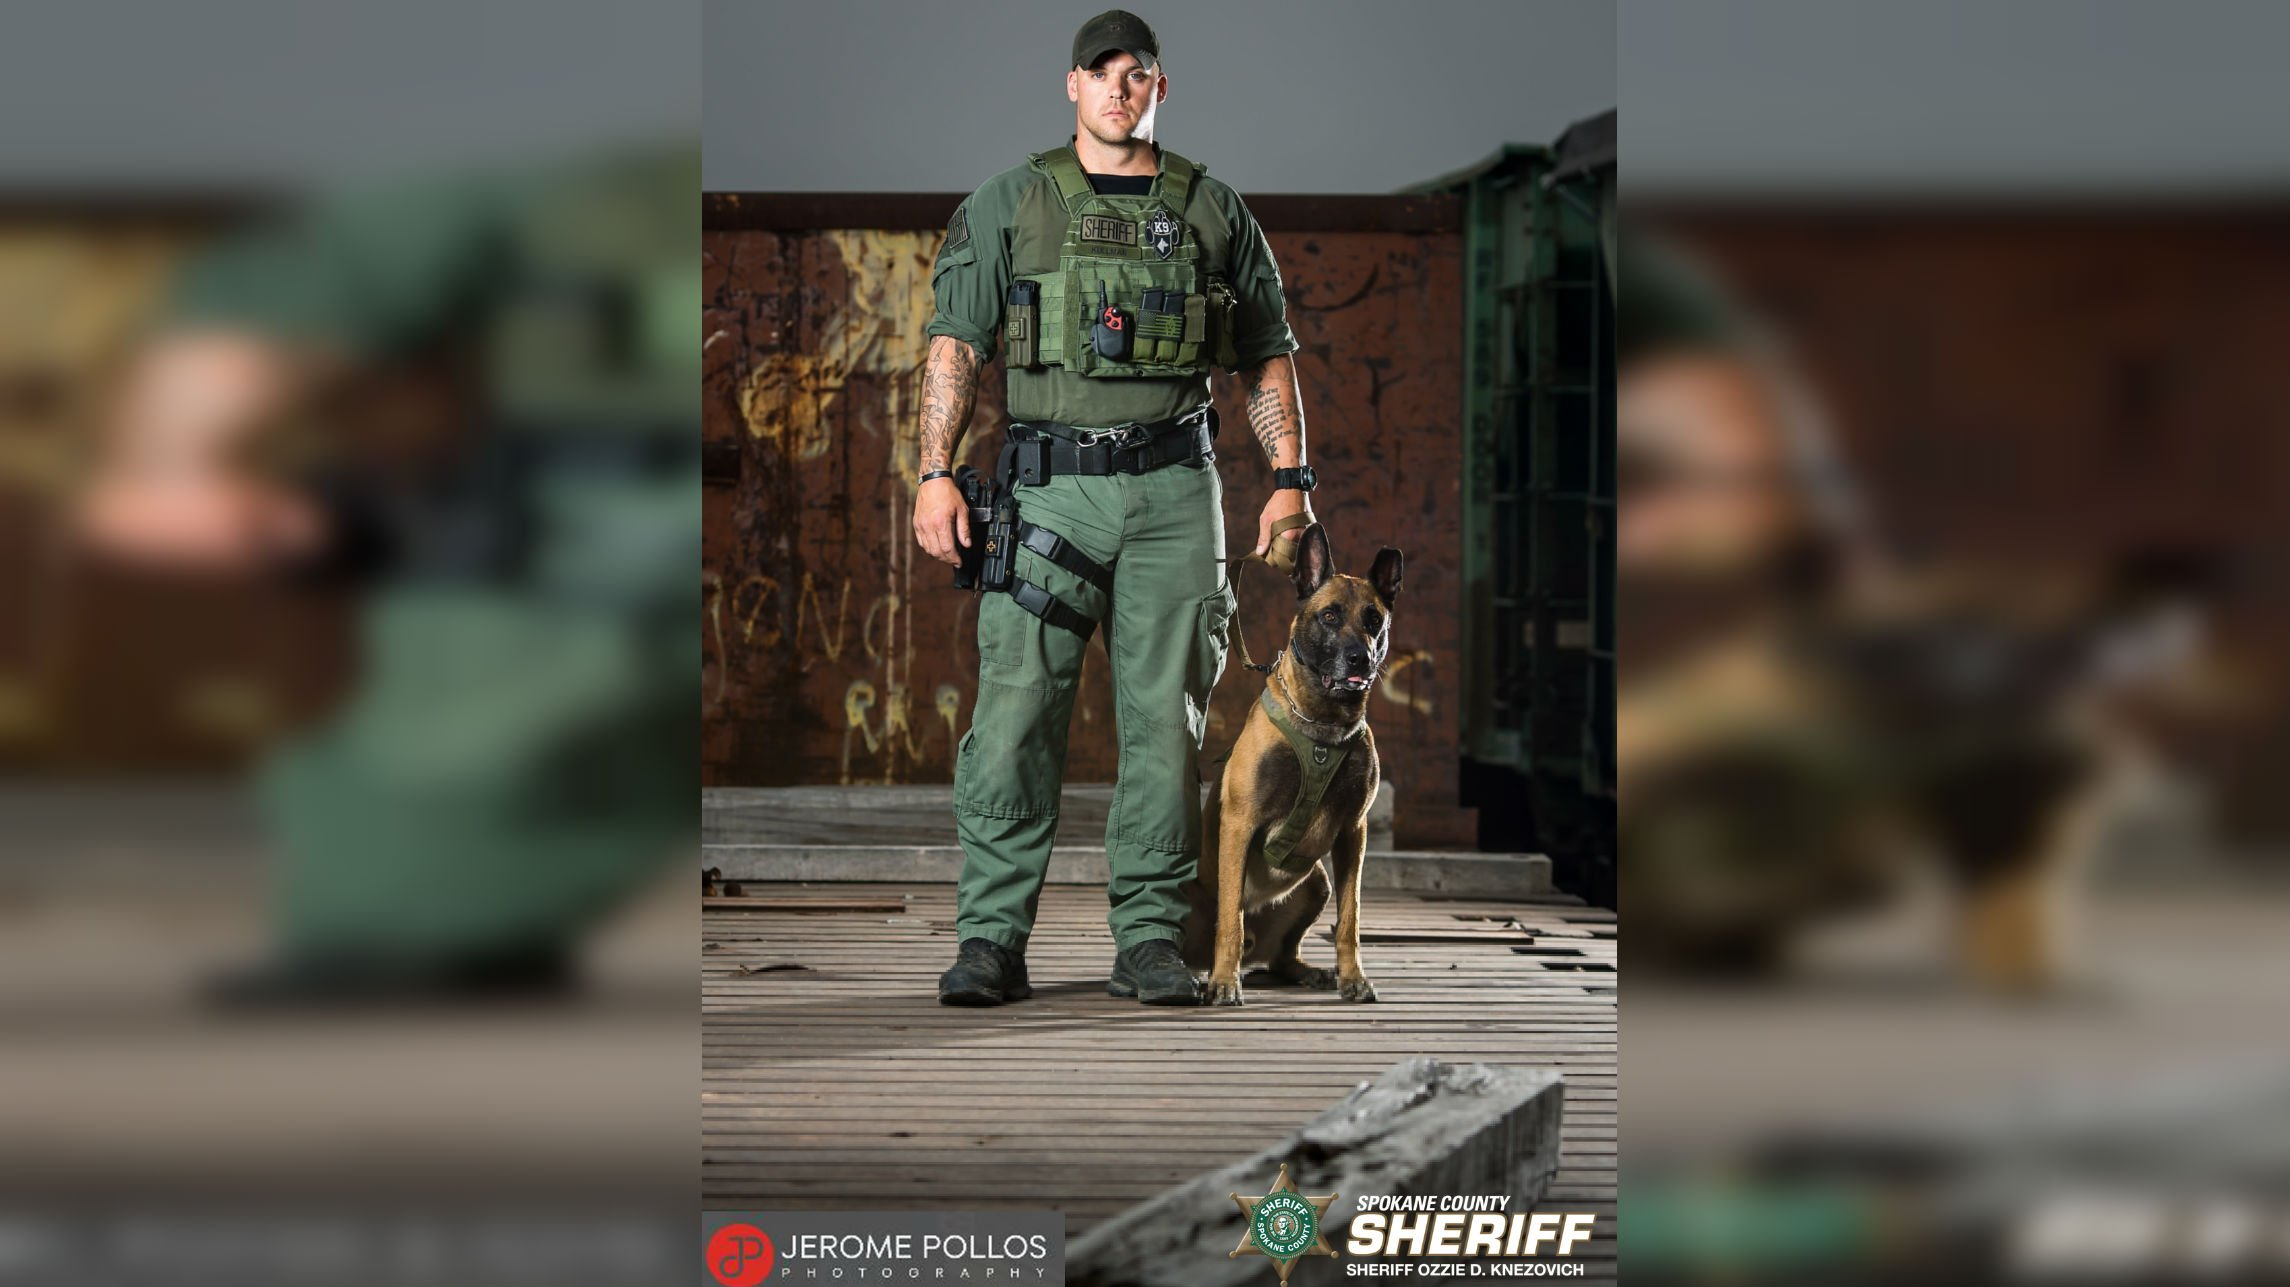 Courtesy Spokane County Sheriff's Office